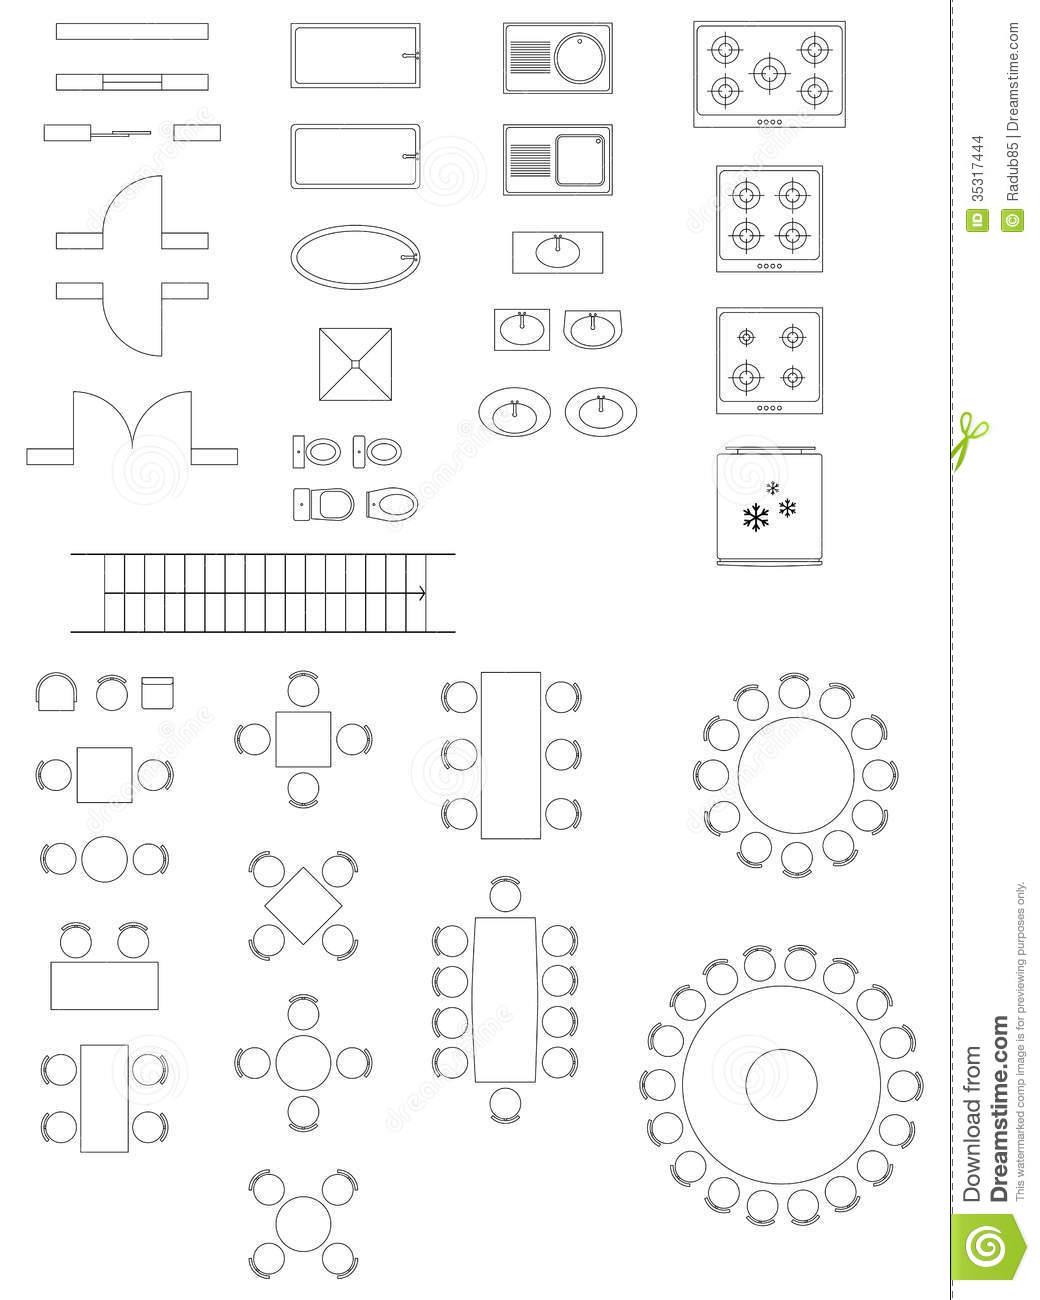 Architectural Floor Plan Symbols Clip Art